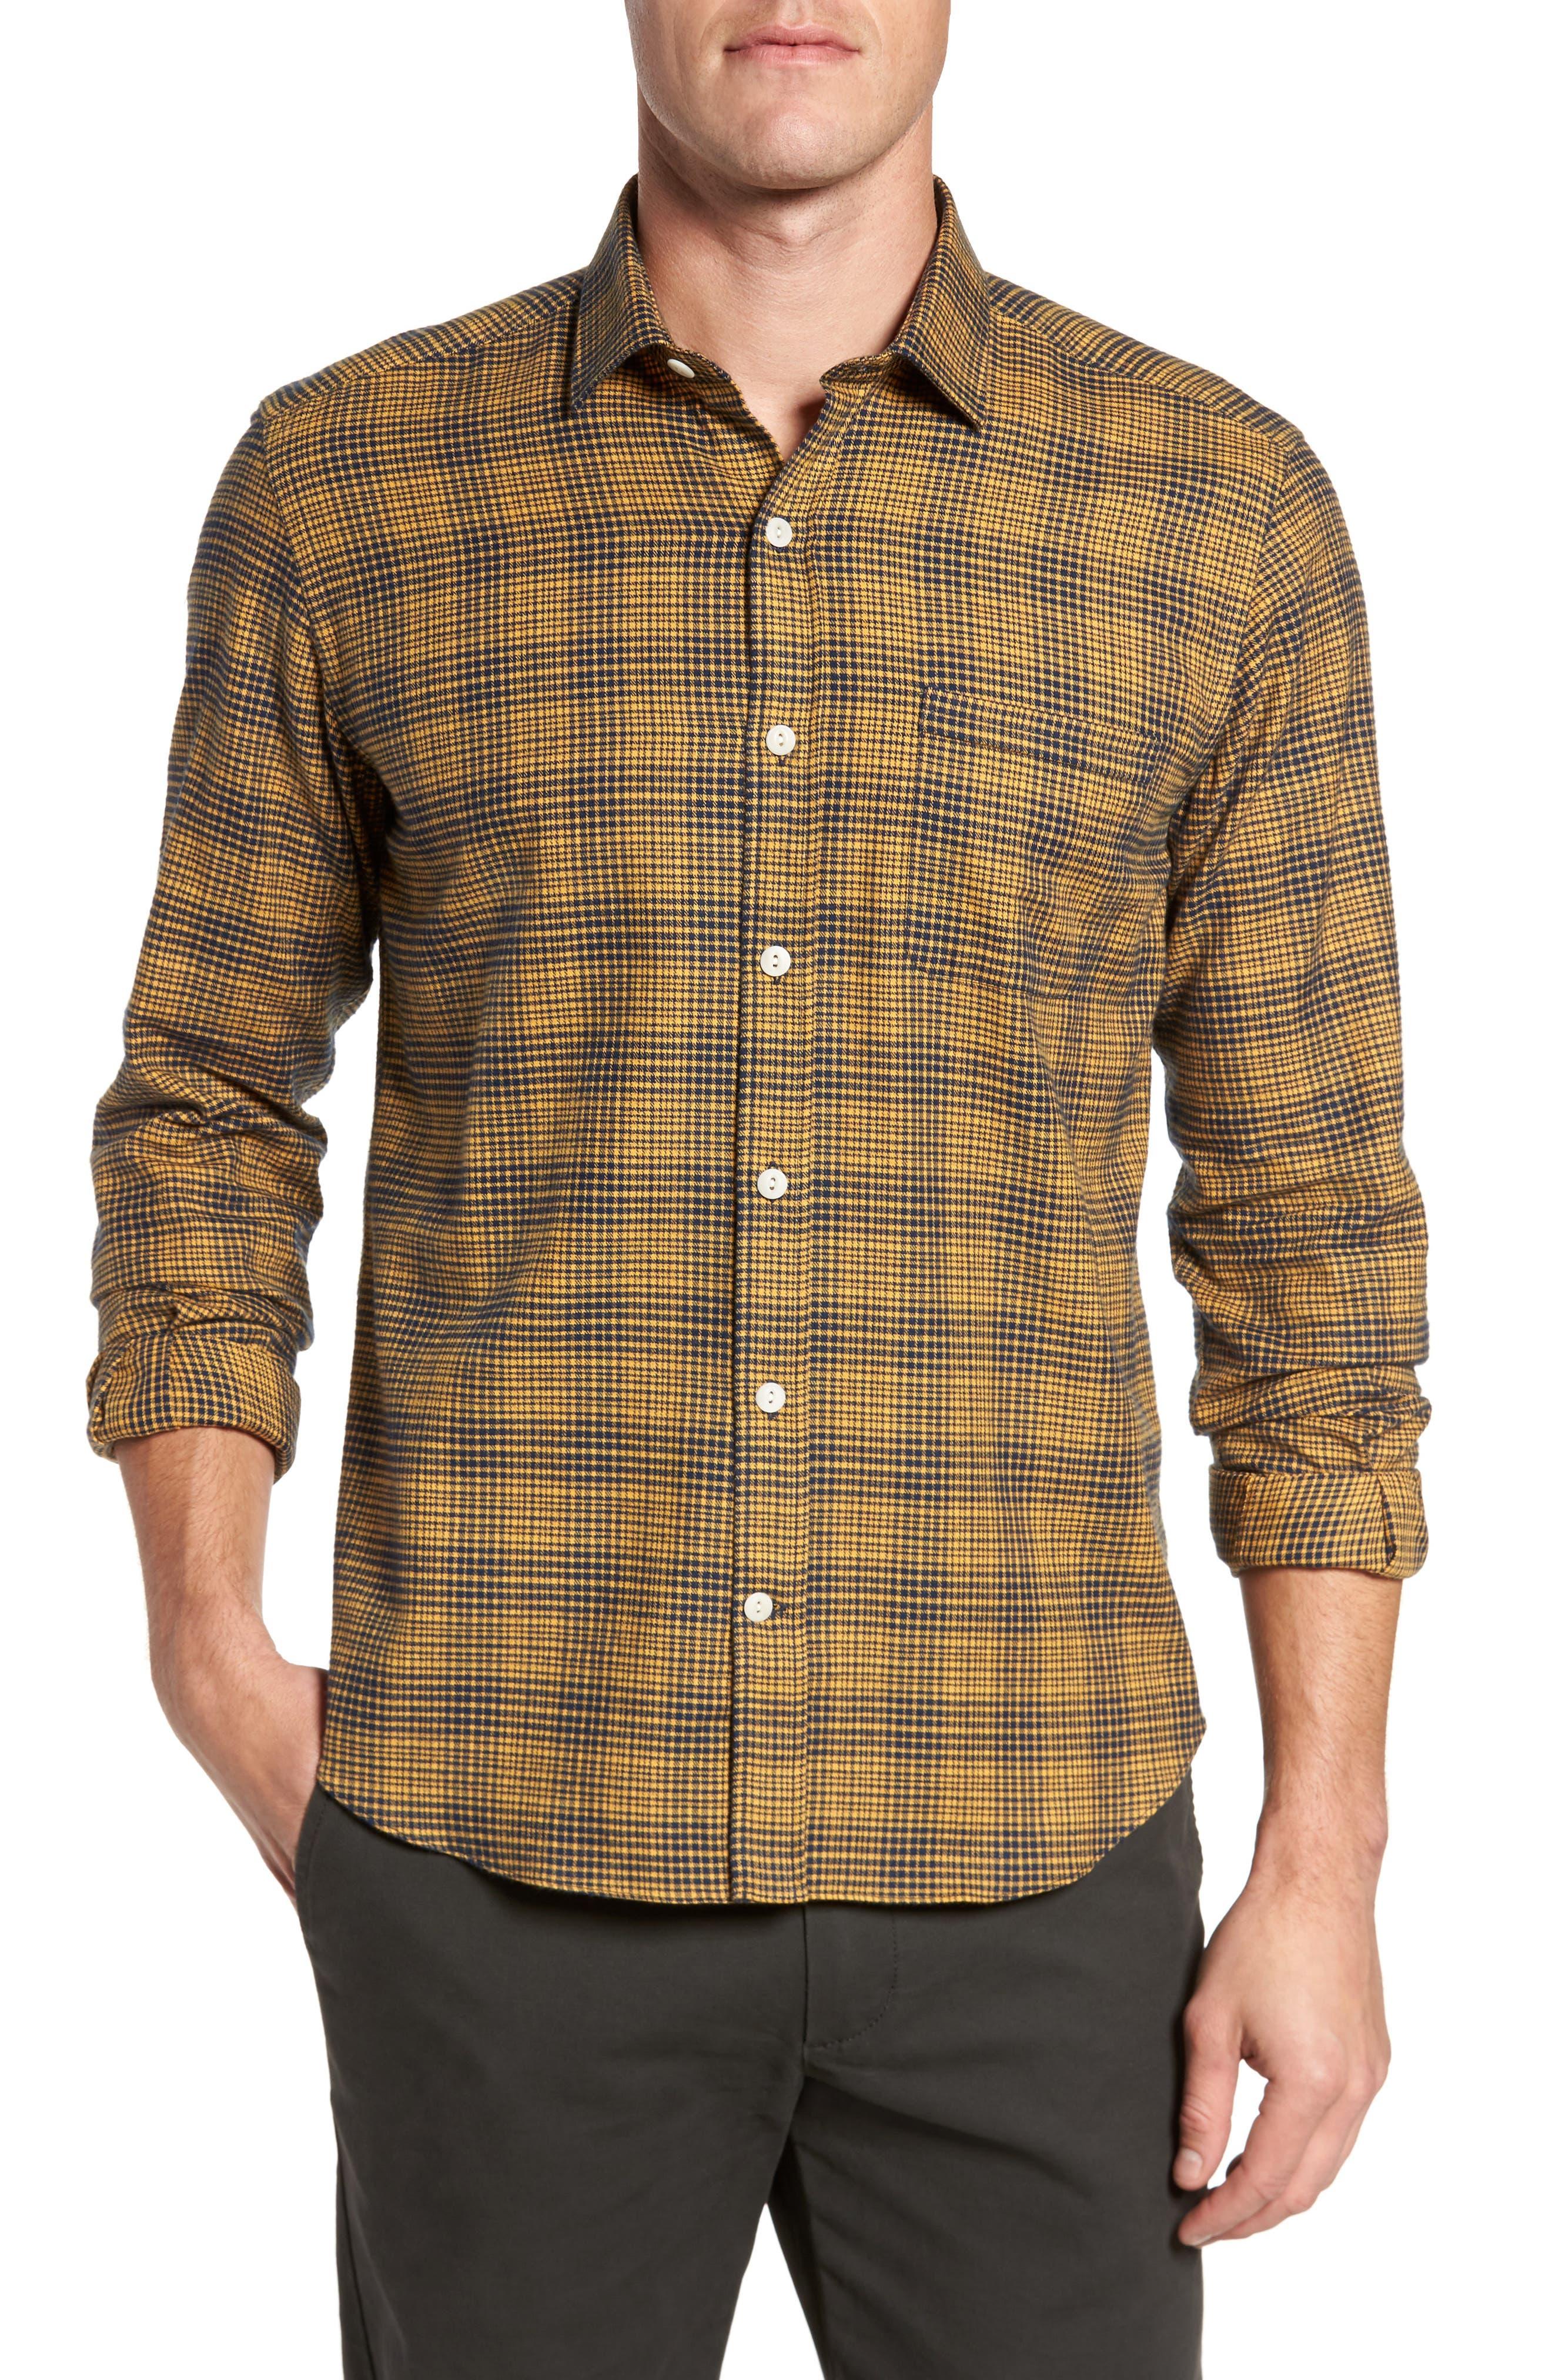 Alternate Image 1 Selected - Culturata Glen Plaid Sport Shirt